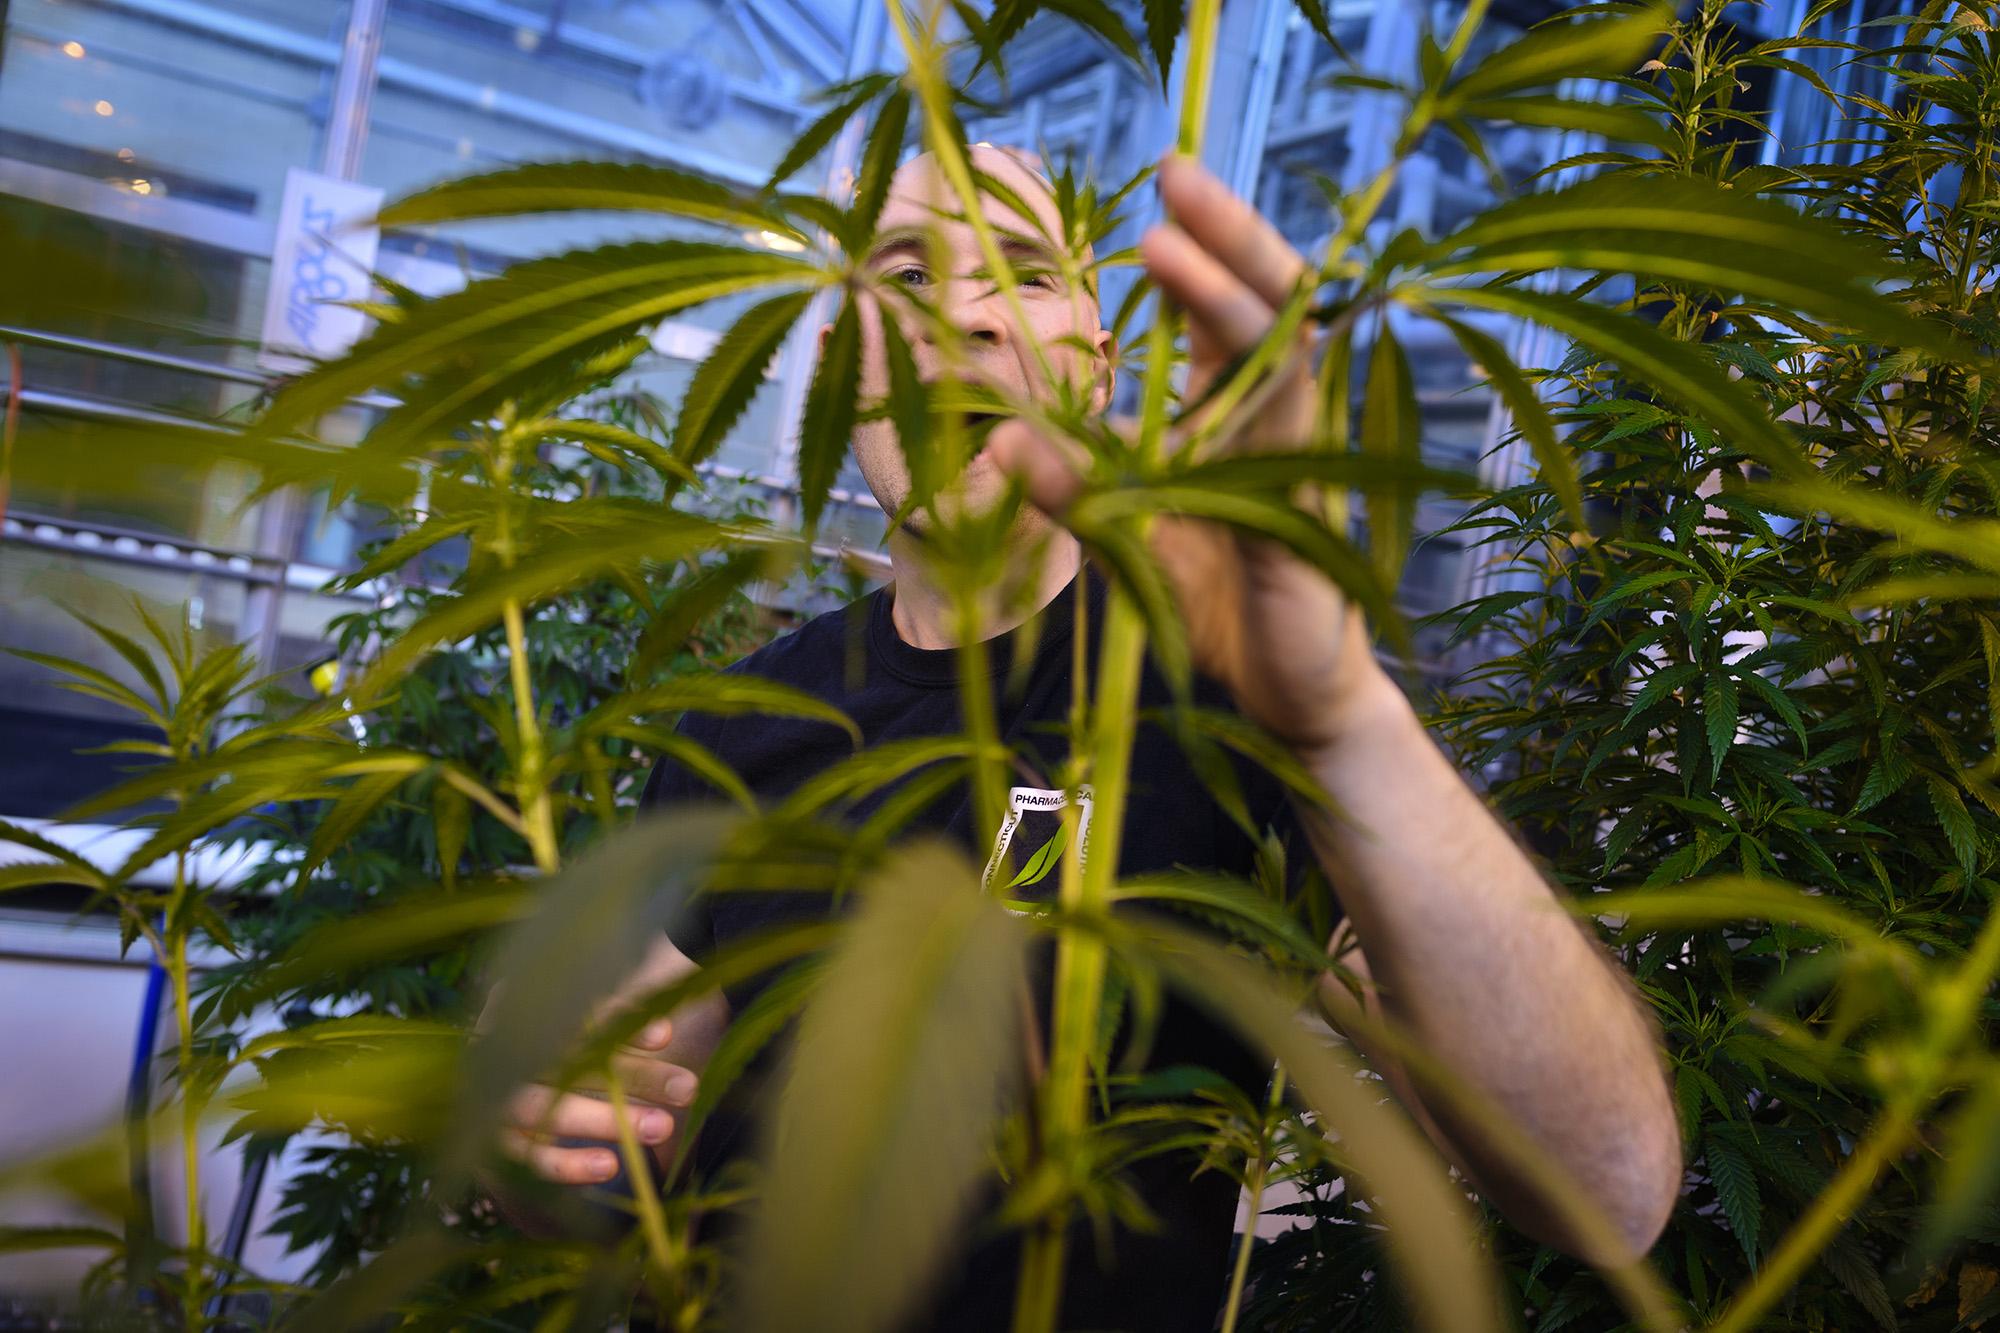 Connecticut passes recreational marijuana bill